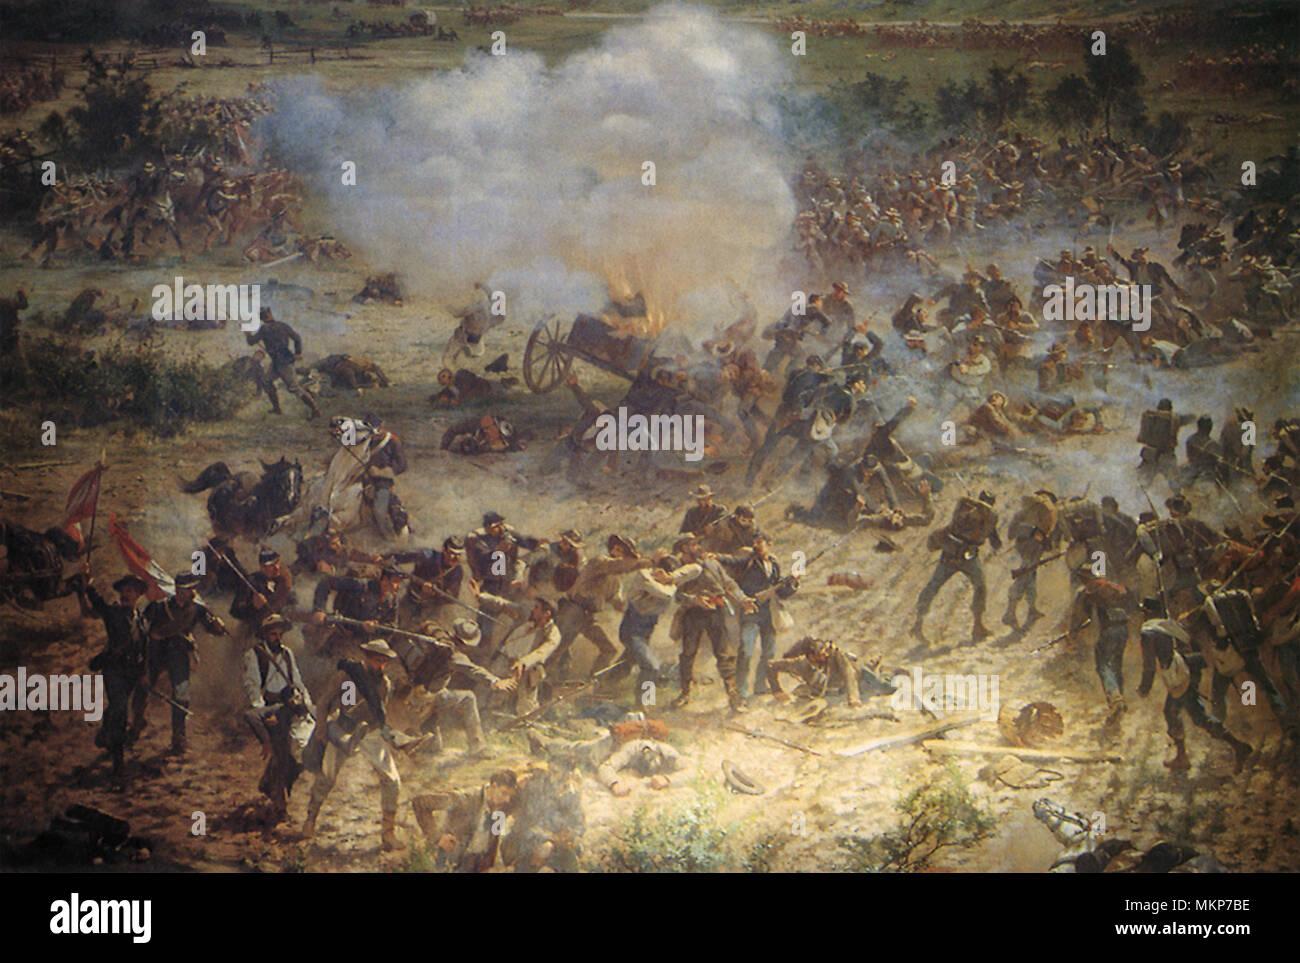 Battle Scene at Gettysburg - Stock Image